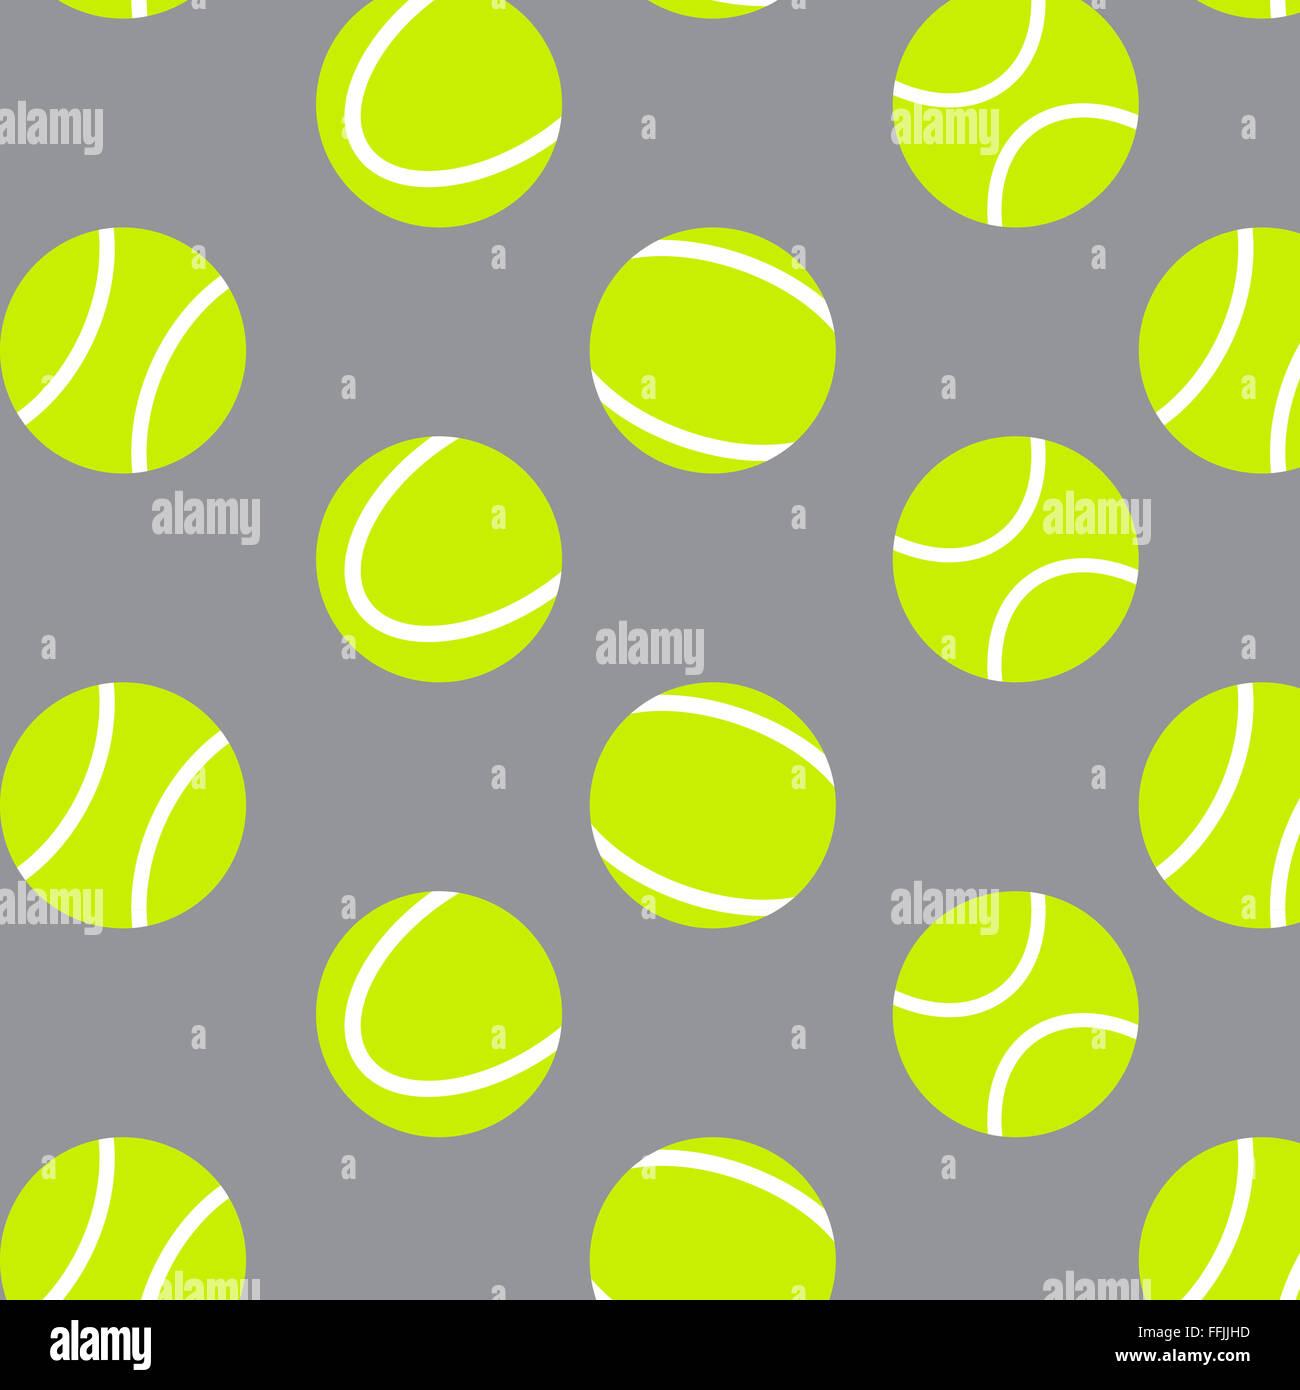 Tennis Ball Musterdesign Hintergrund. Tennis Sport Musterdesign, Kugel-Wiederholung. Vektor abstrakte flaches Design Stockbild